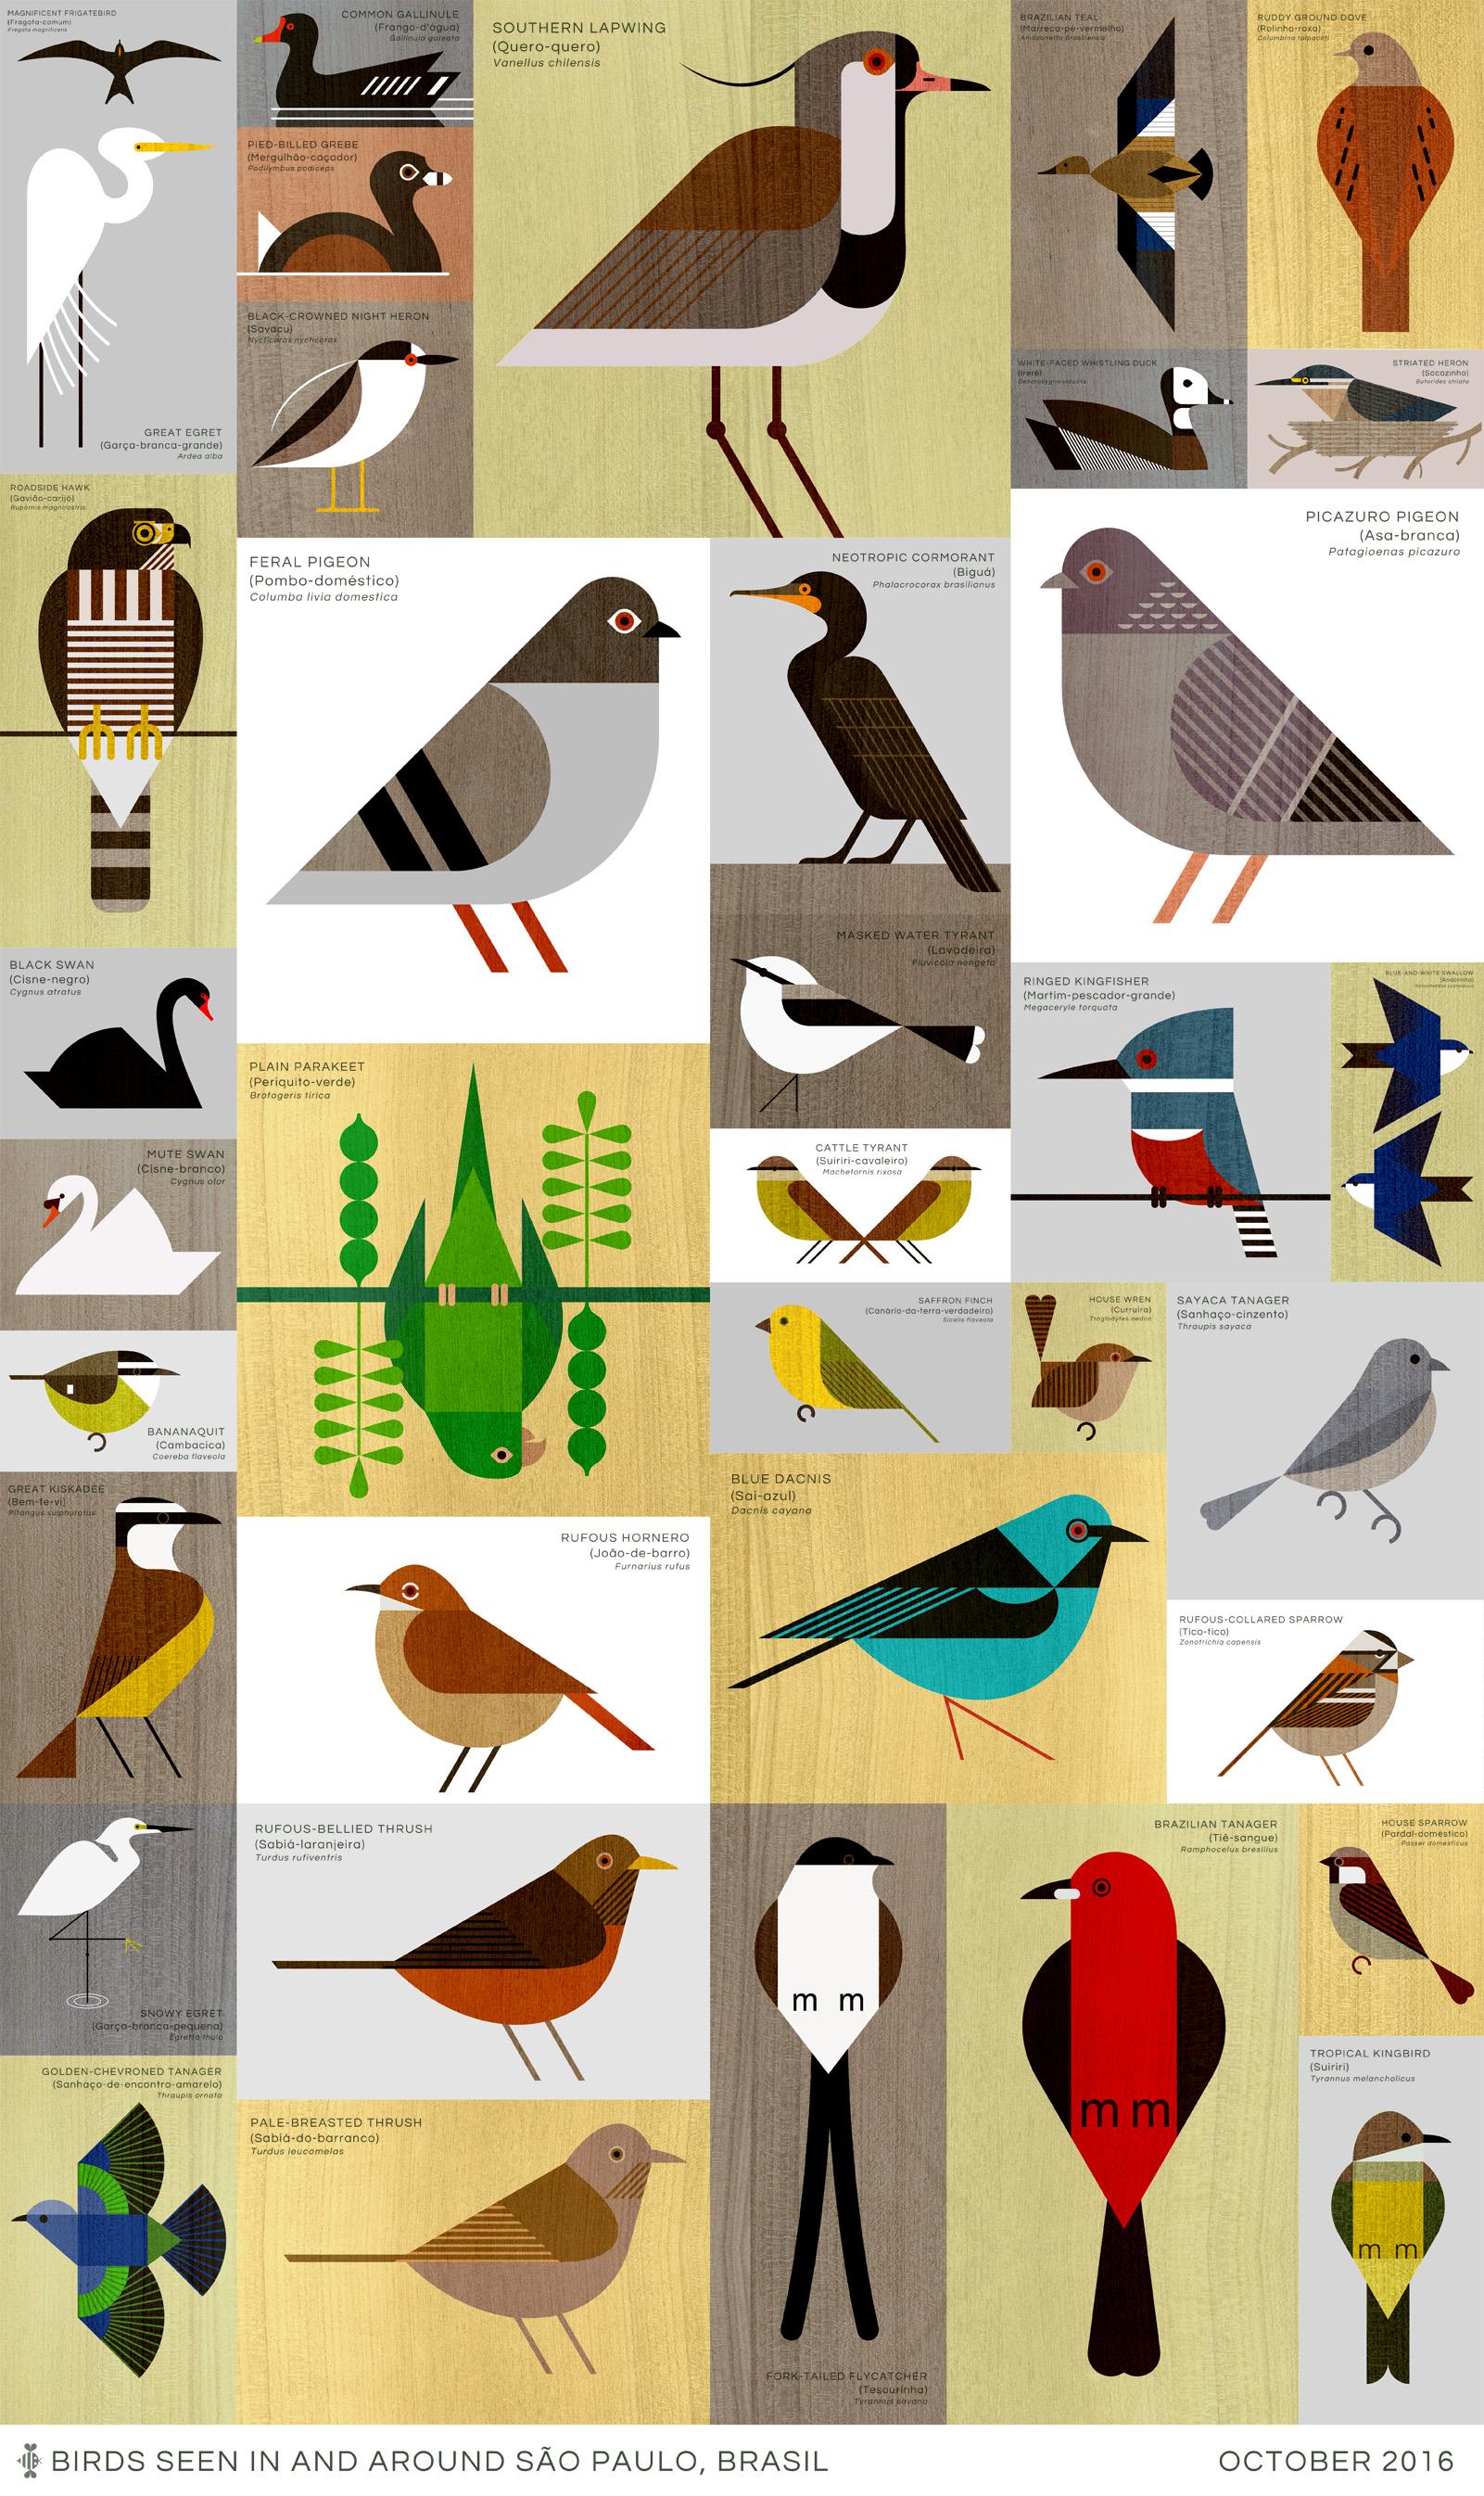 scott partridge - São Paulo Birds - illustration